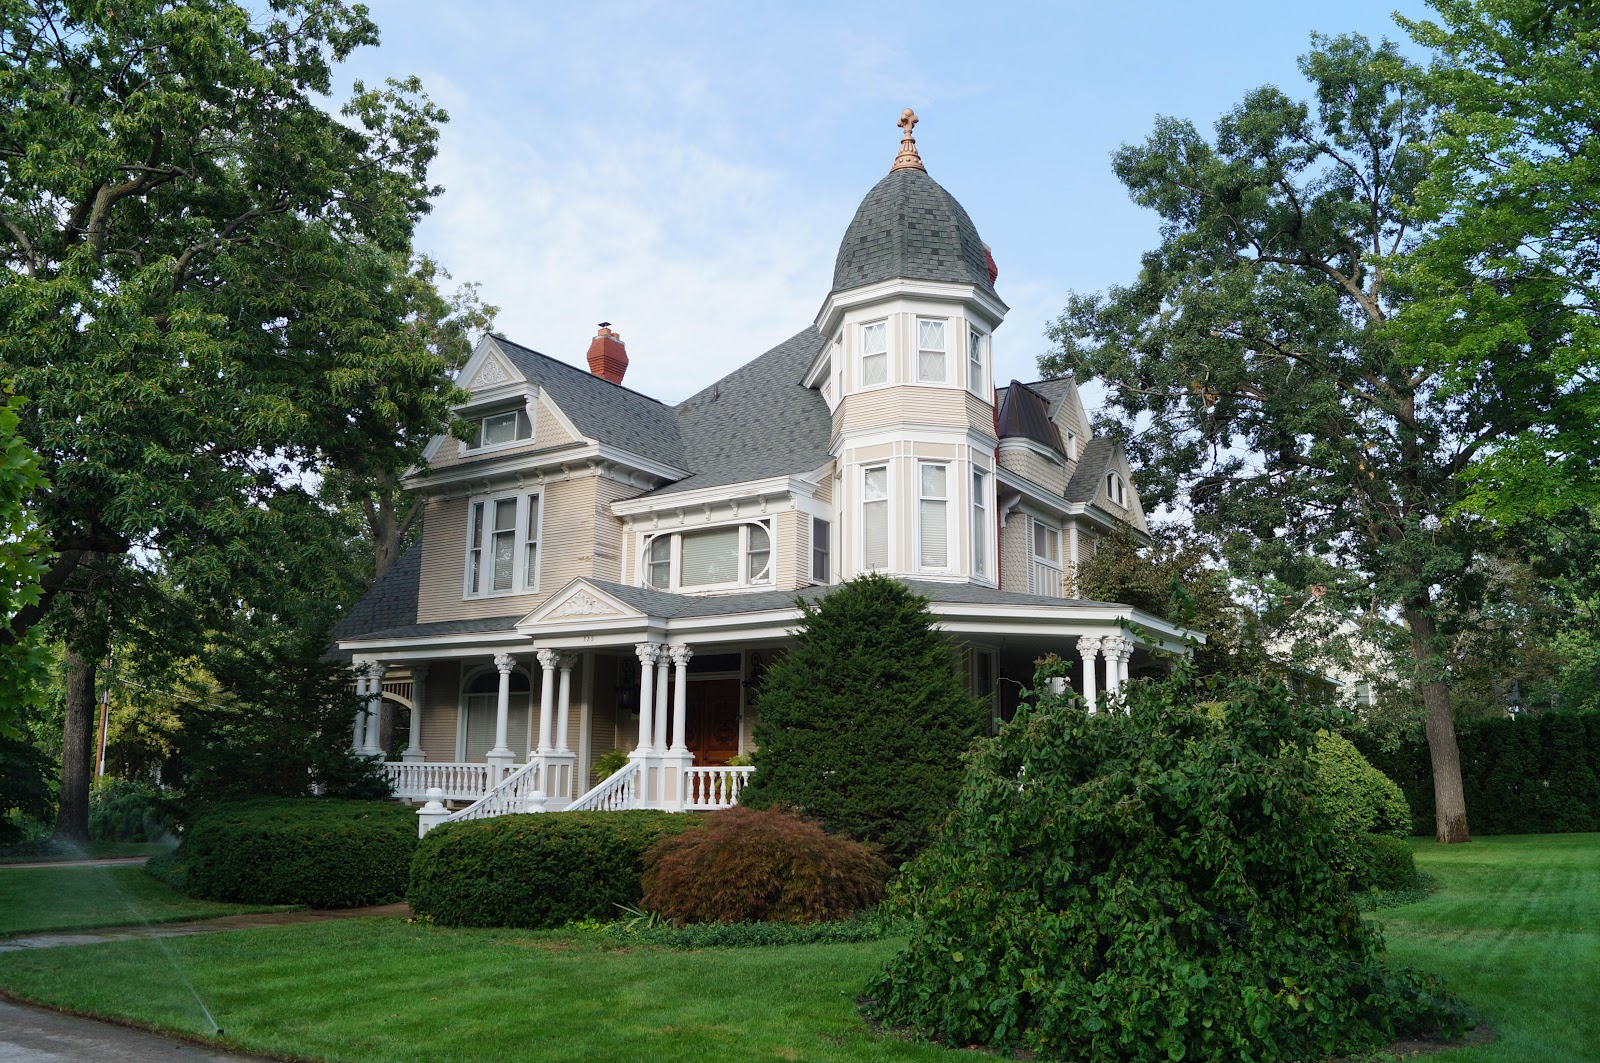 The Plum Nickel Home In Traverse City Michigan